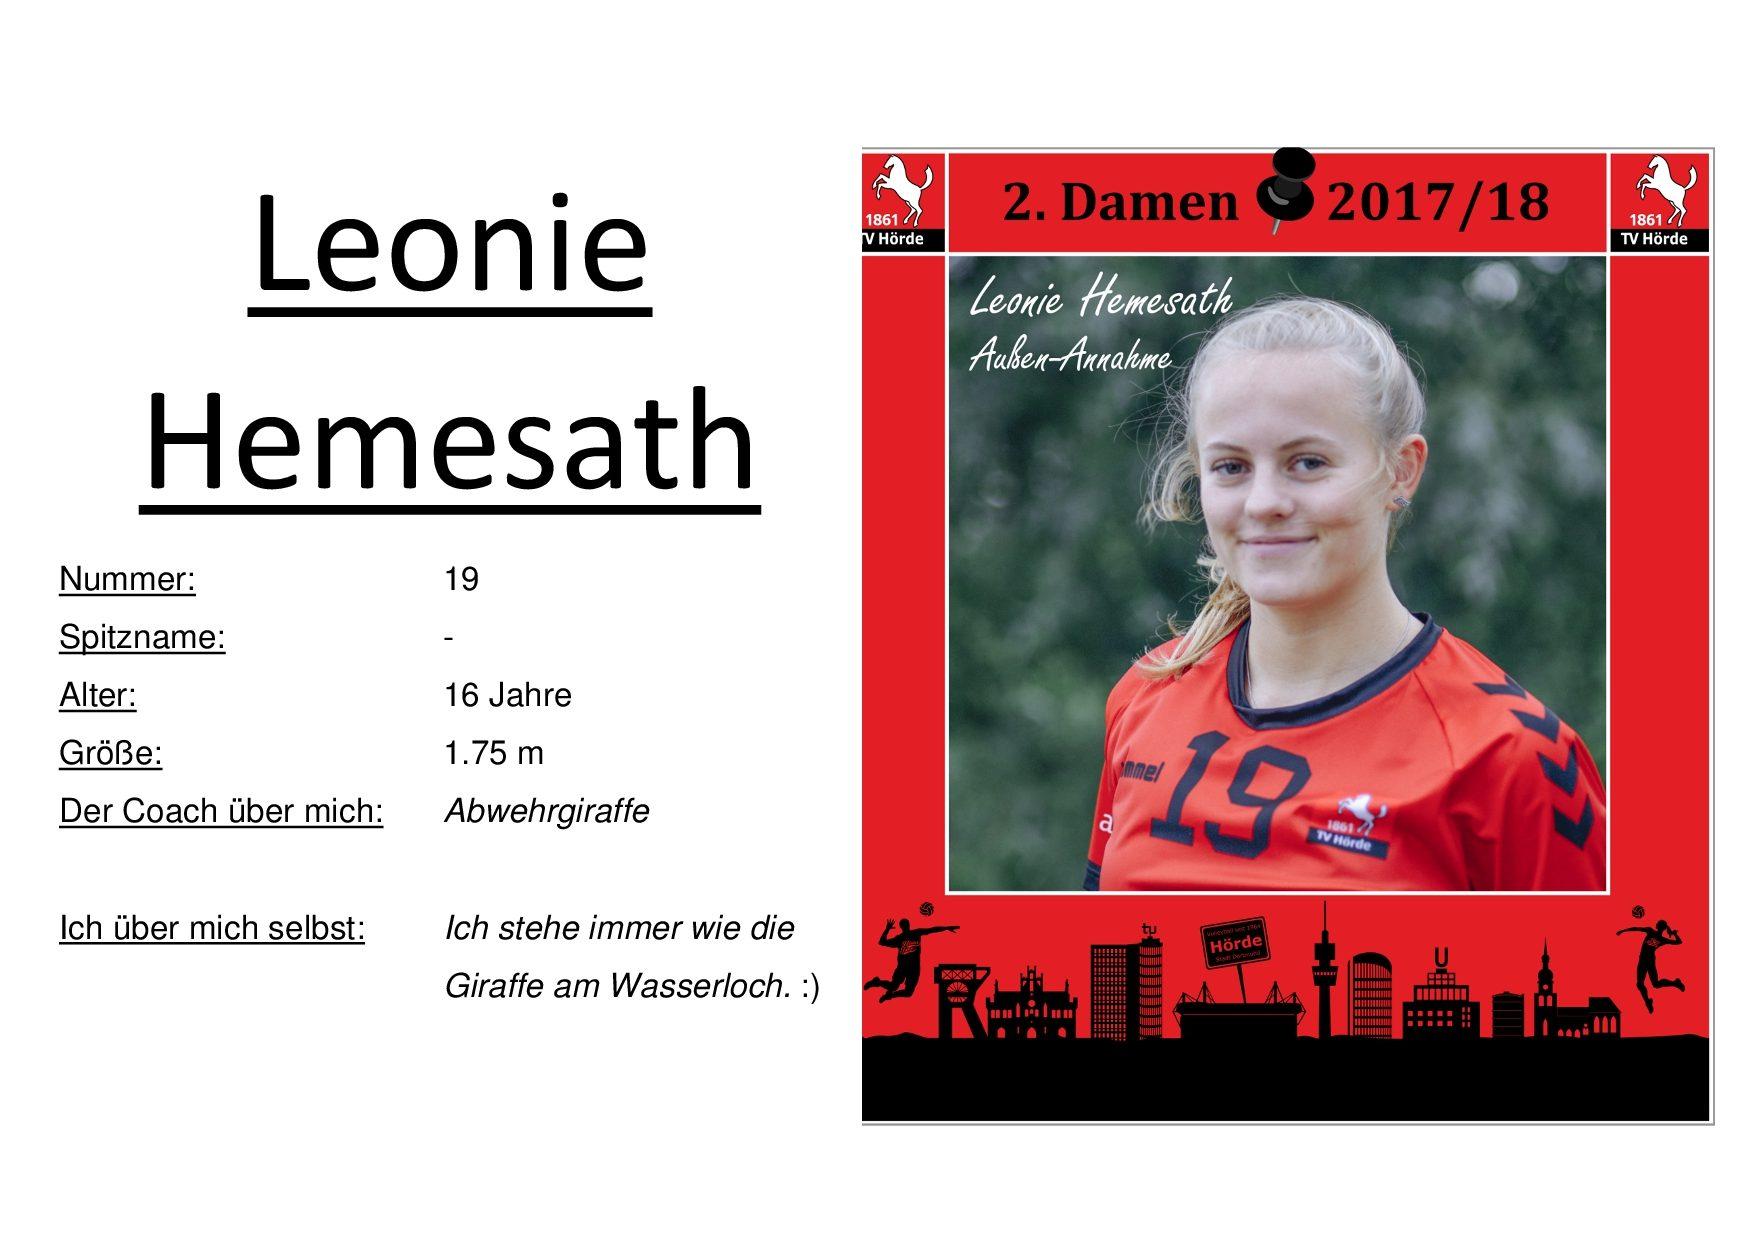 Leonie Hemesath